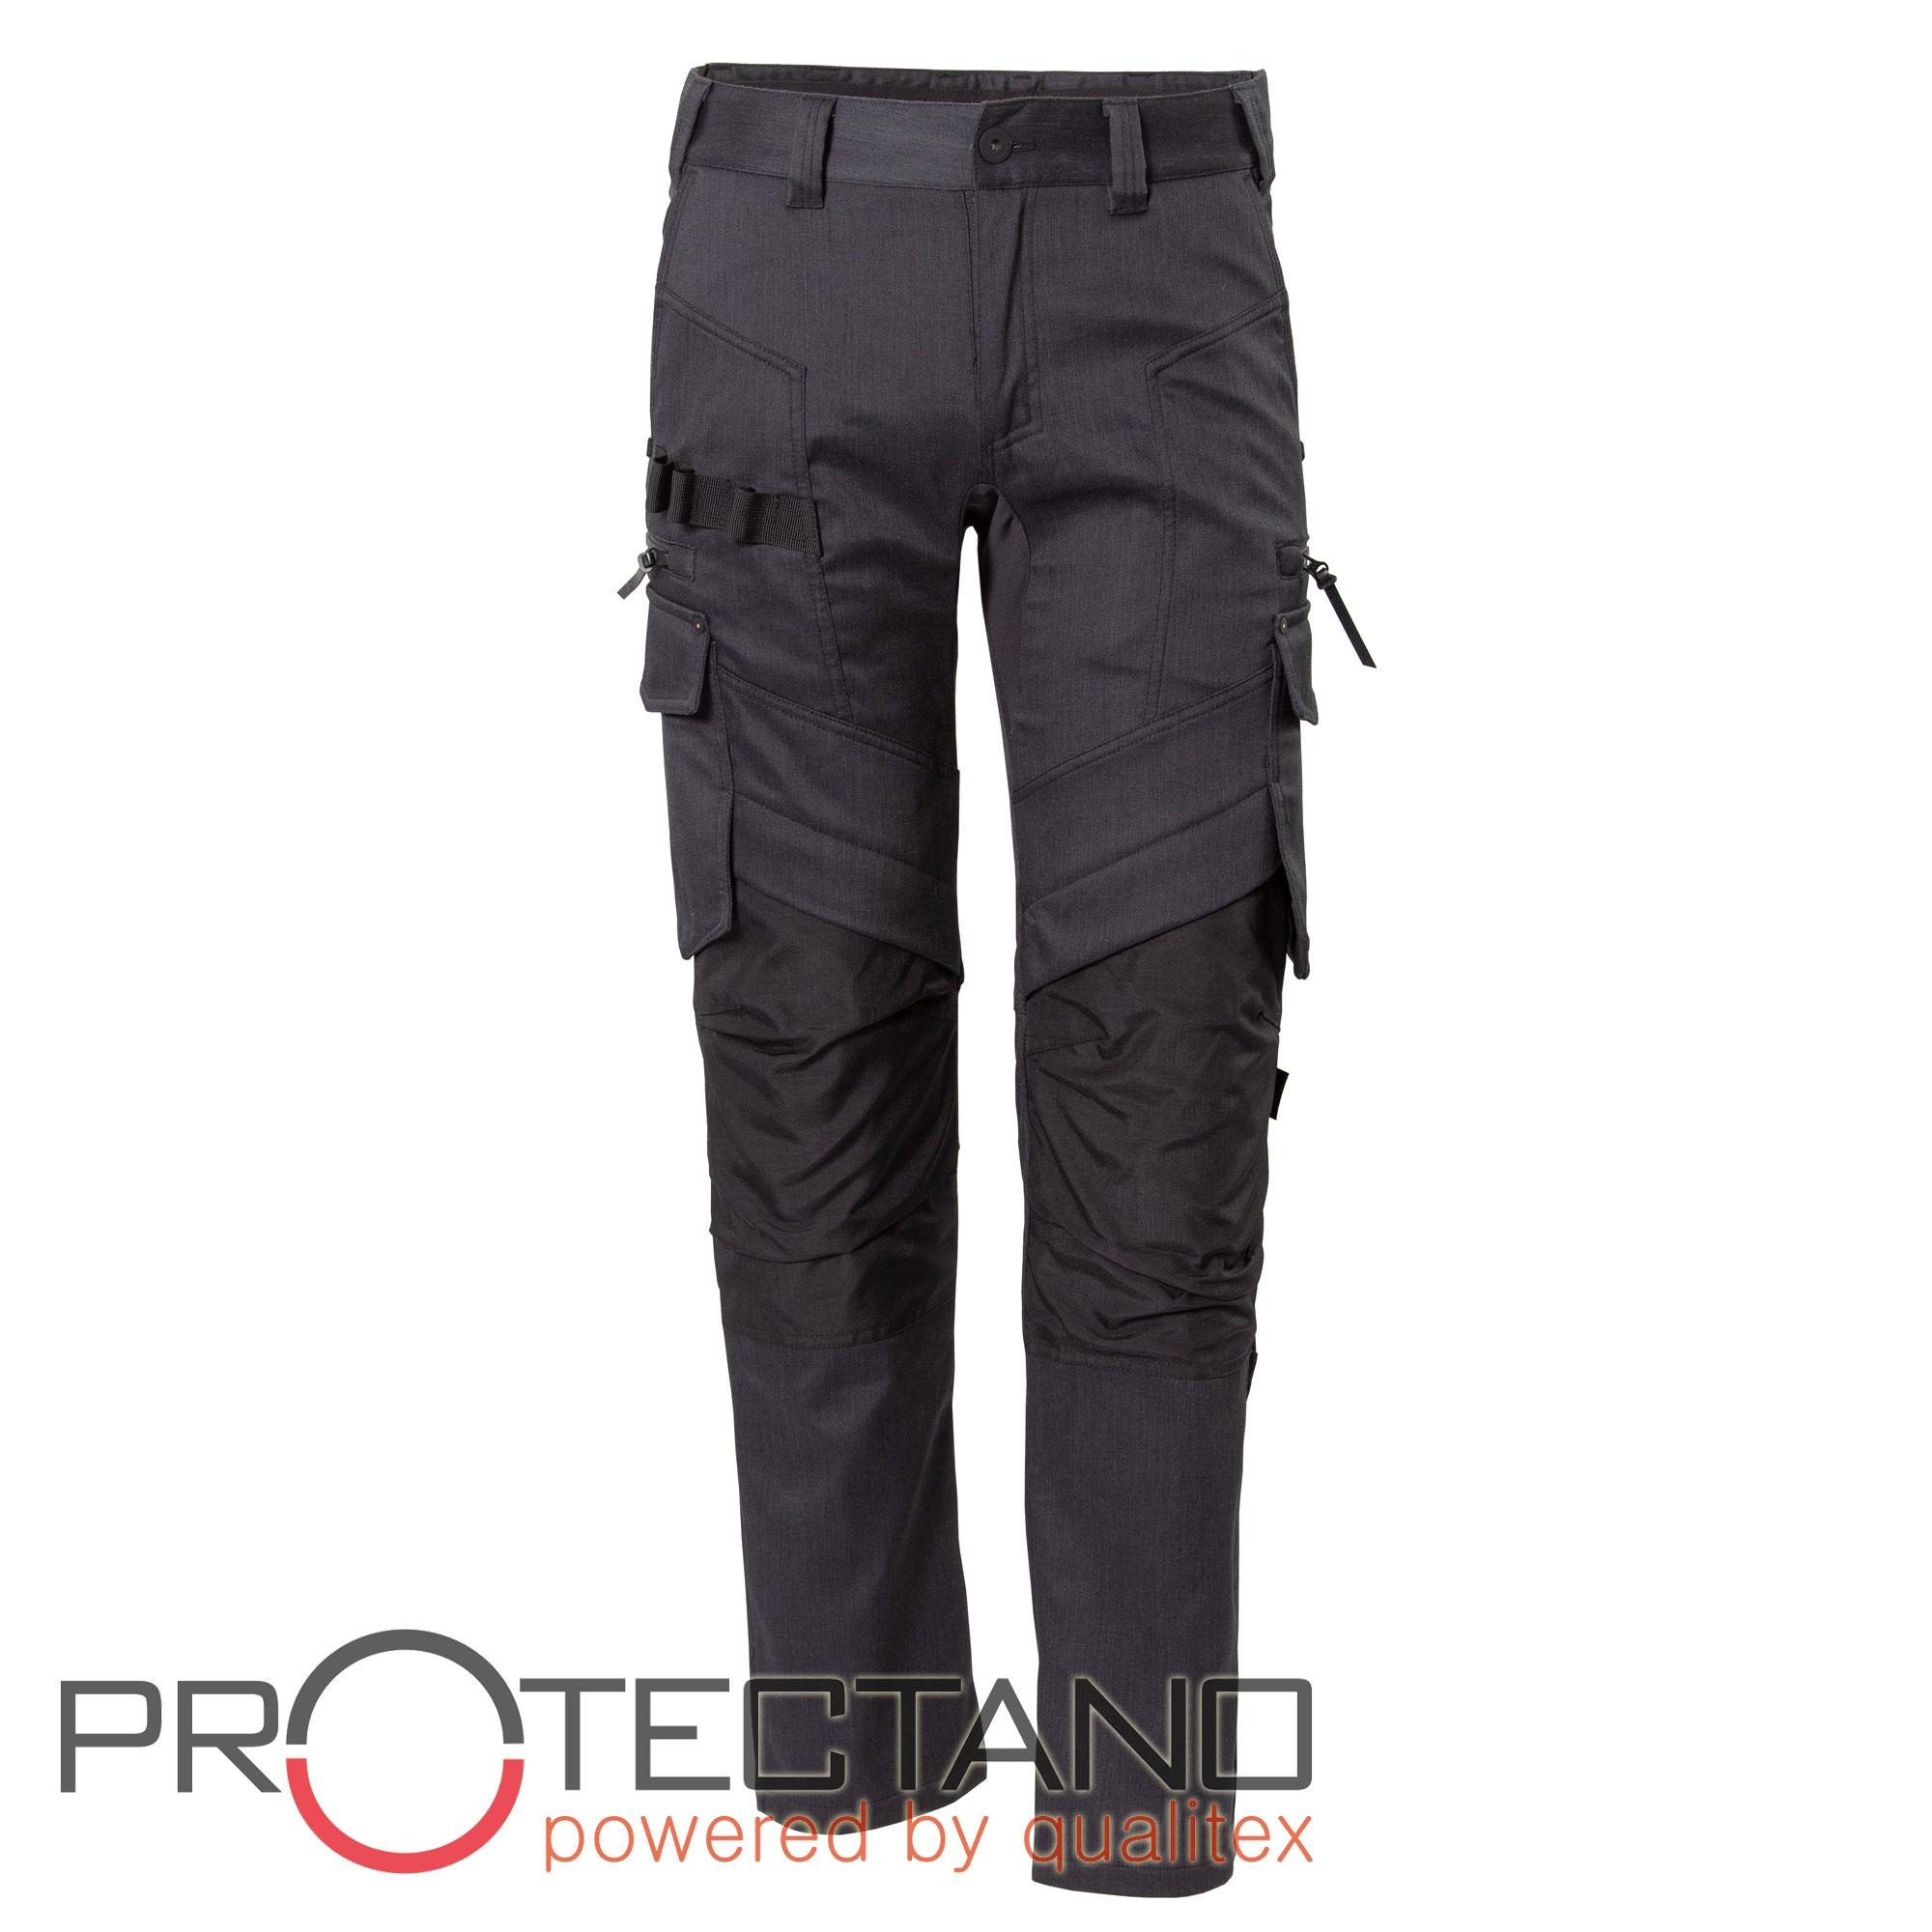 Qualitex-Protectano-Winter-Bundhose-Arbeitshose-Worker-Hose-Cordura-S-3XL Indexbild 8